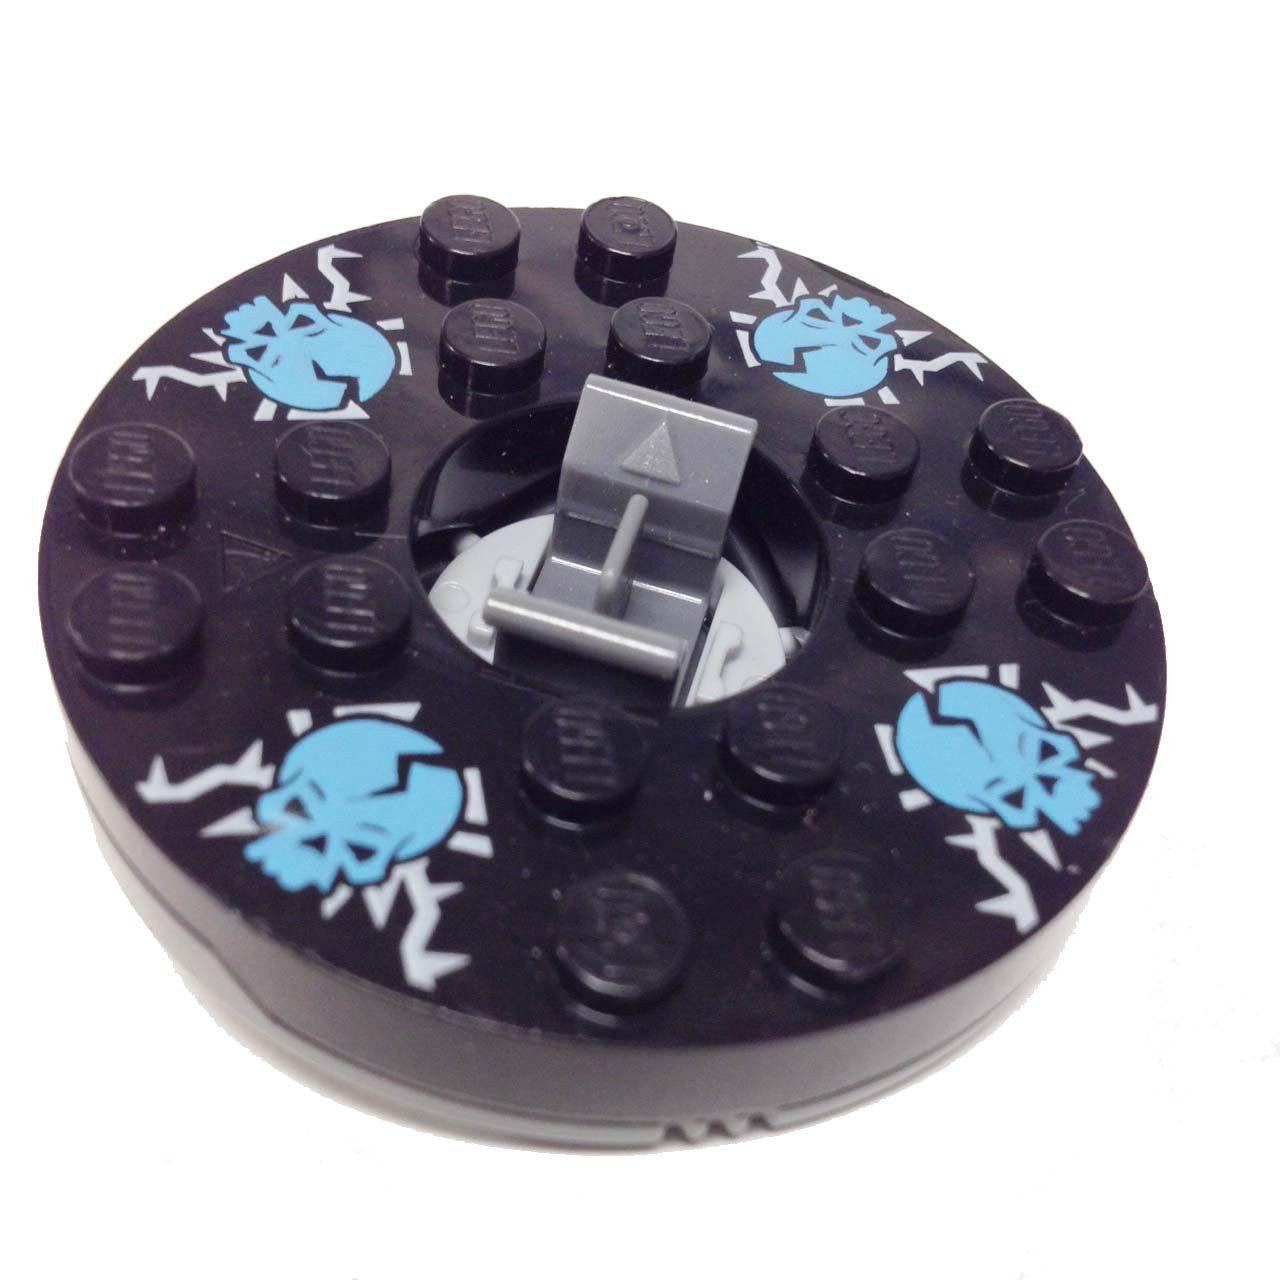 Lego parts turntable 6 x 6 bonezai battle arena